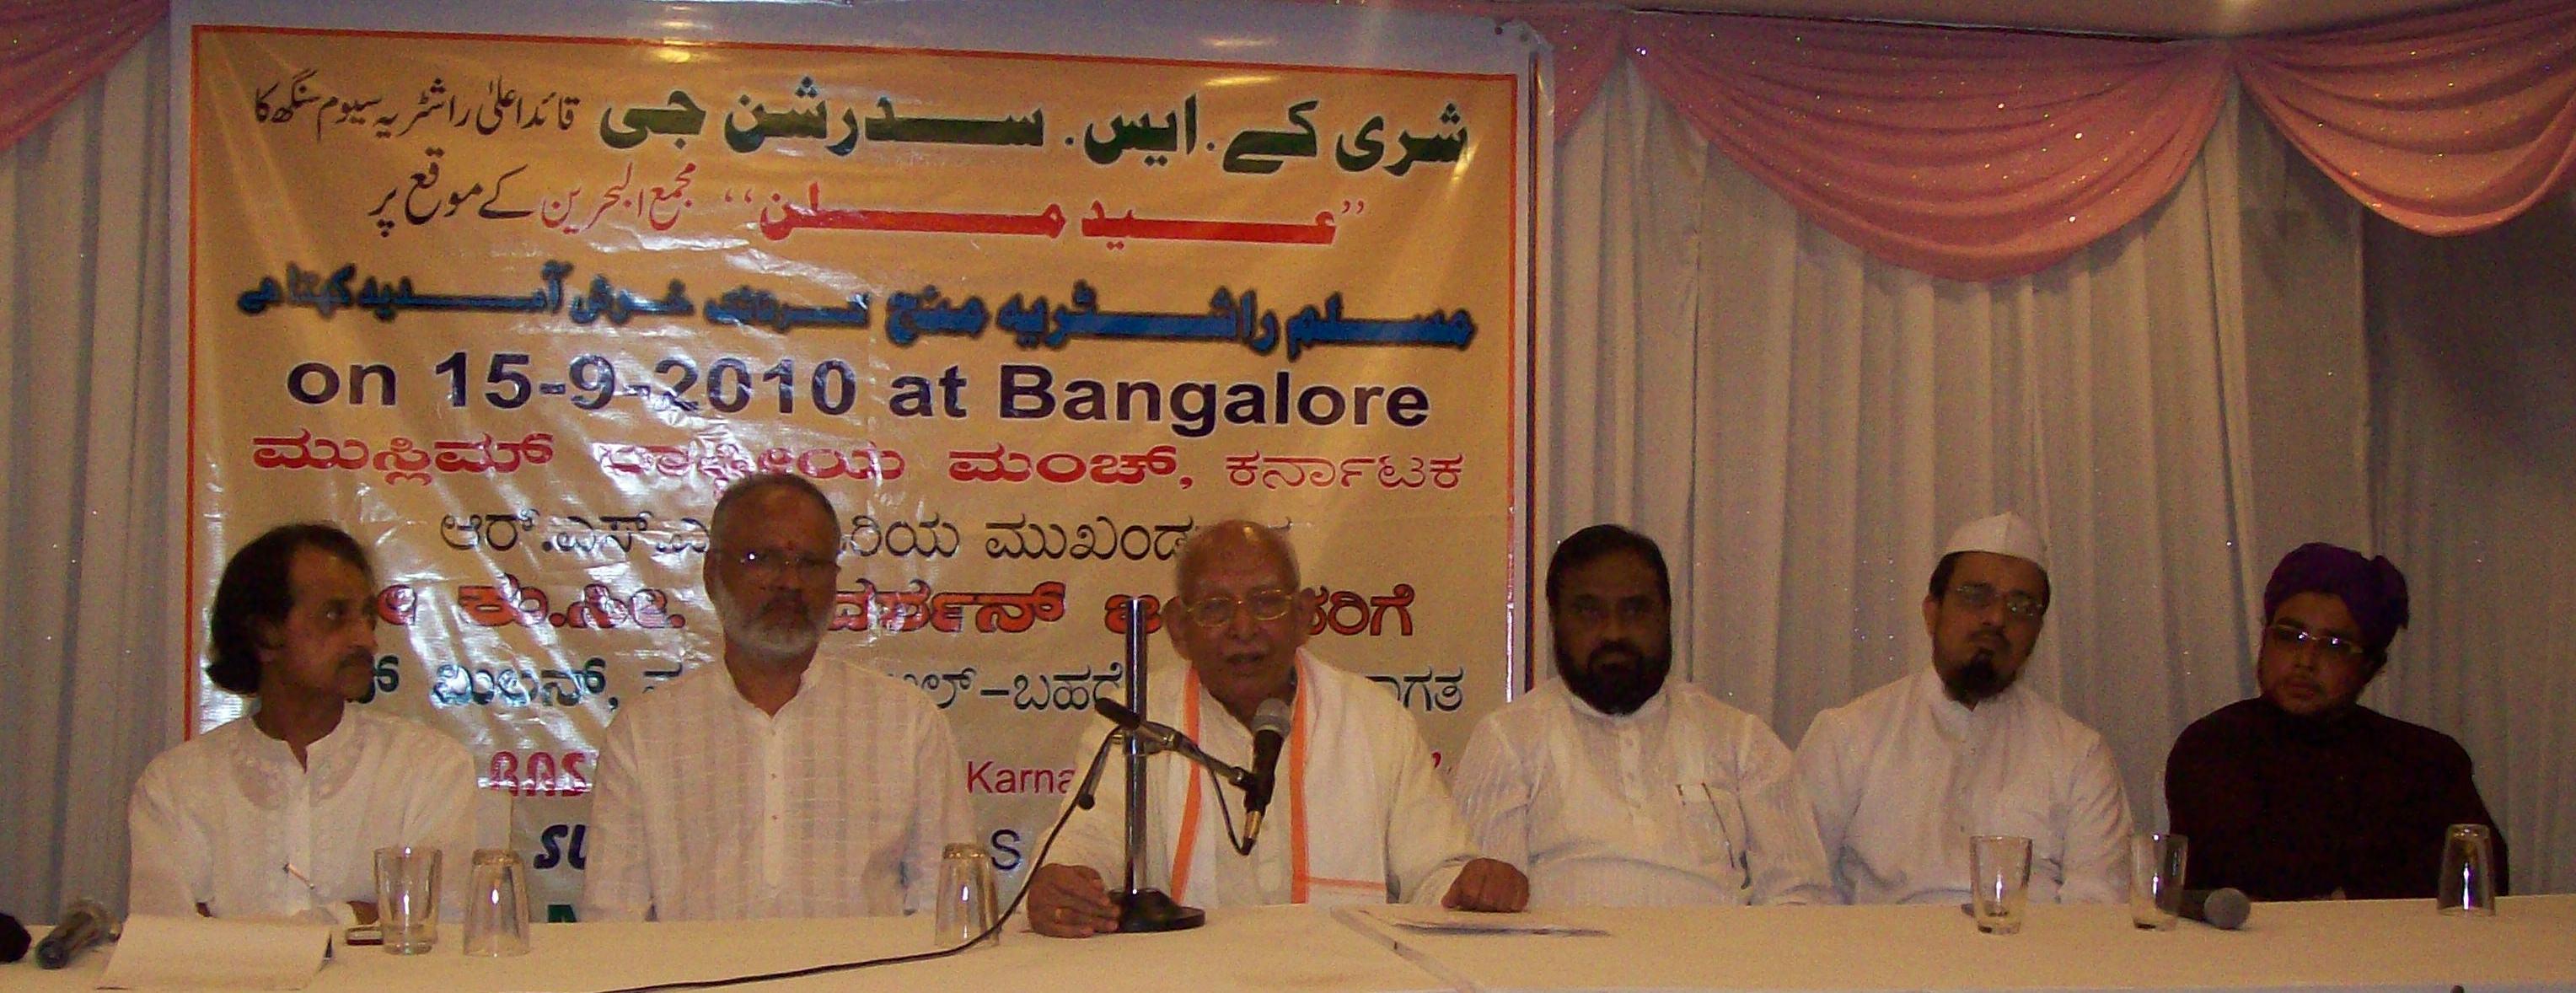 RSS Calls for Hindu – Muslim Unity